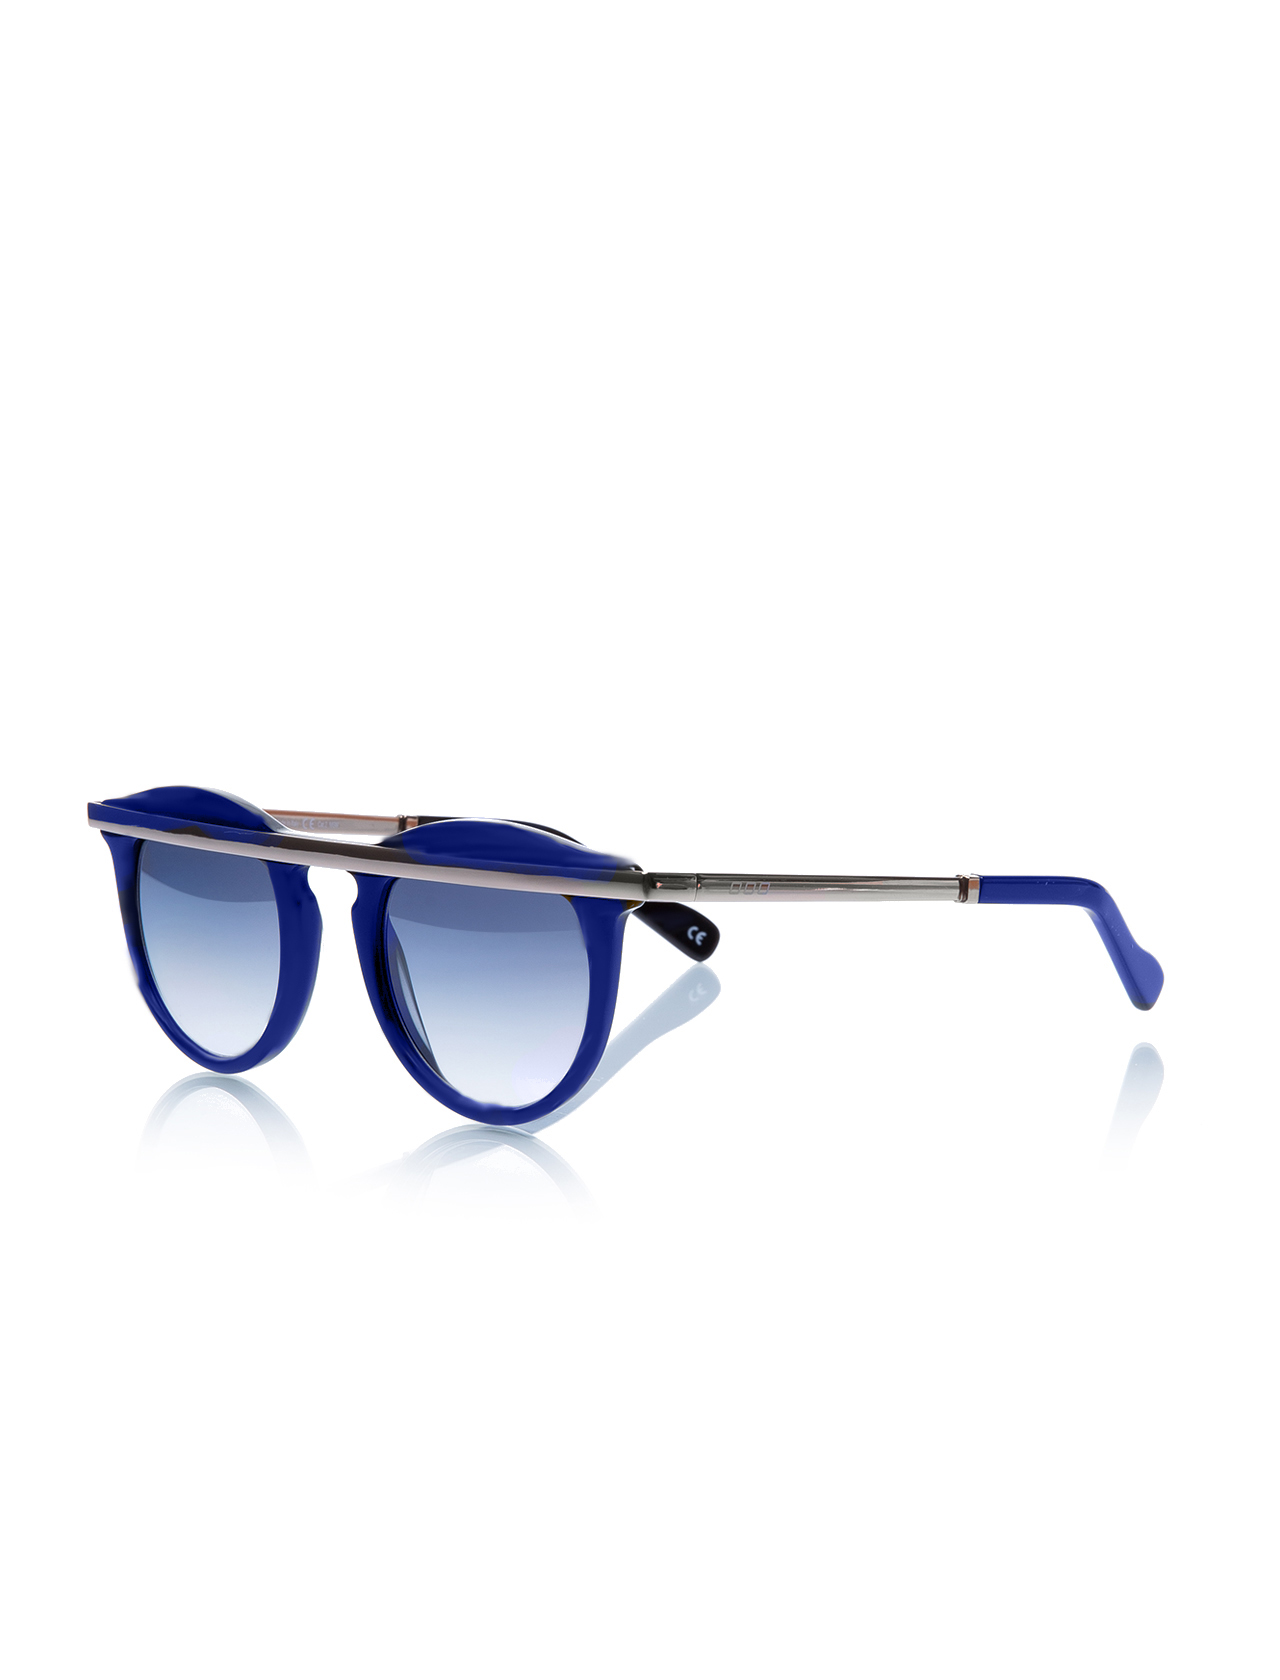 Unisex sunglasses nl 30043 a3062 2ak bone navy blue organic round round 47-23-140 no logo